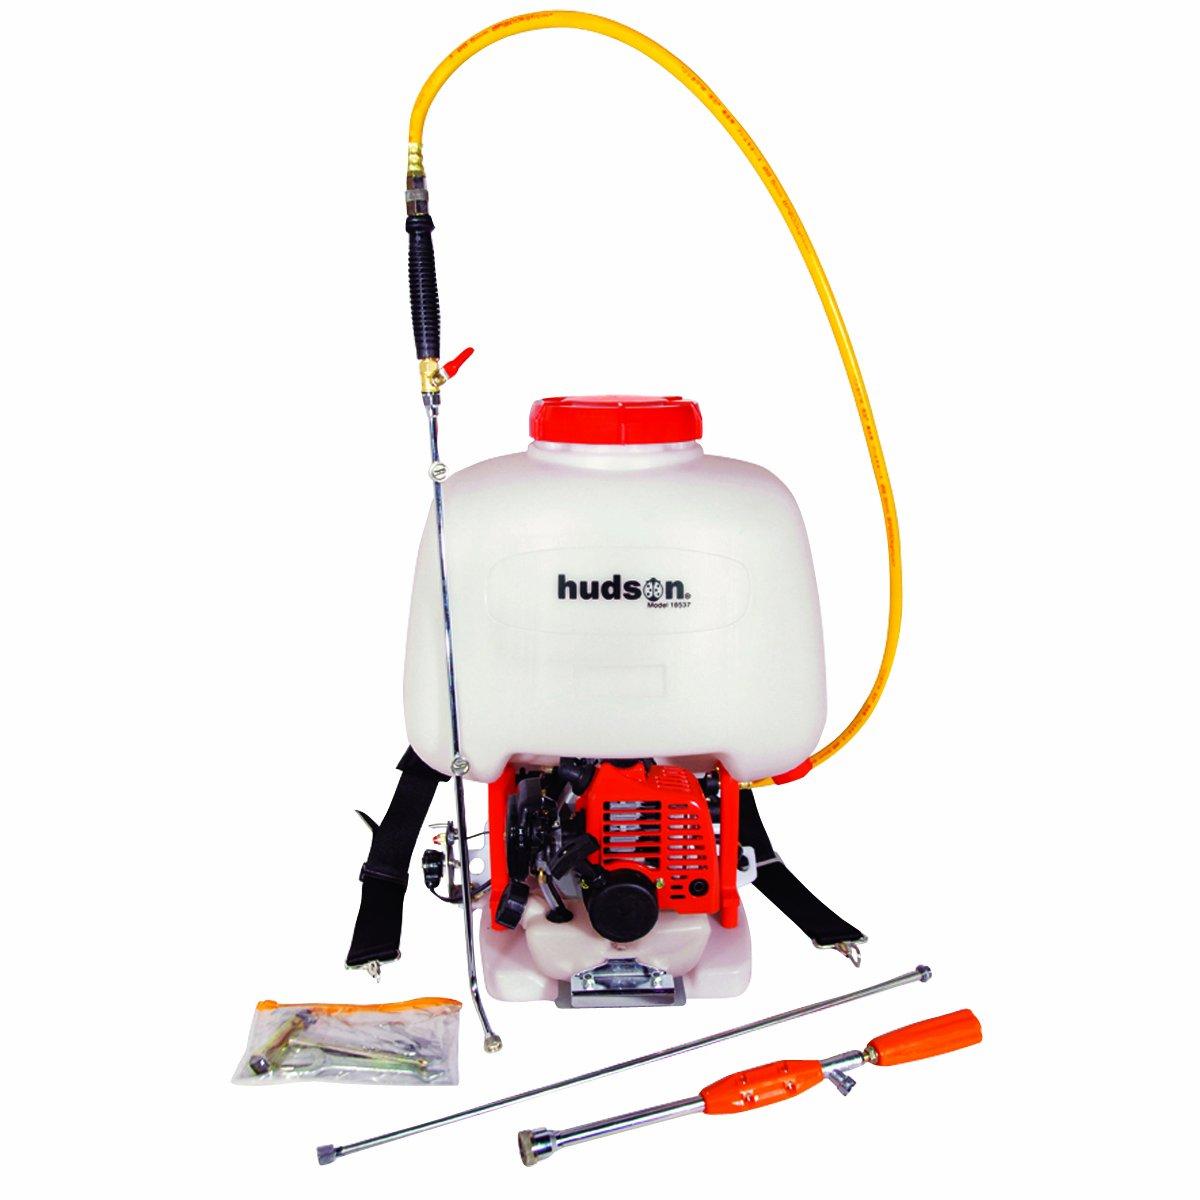 Hudson 18537 6.5 Gallon 1 HP 2 Stroke Gas Powered Professional Bak-Pak Power Sprayer